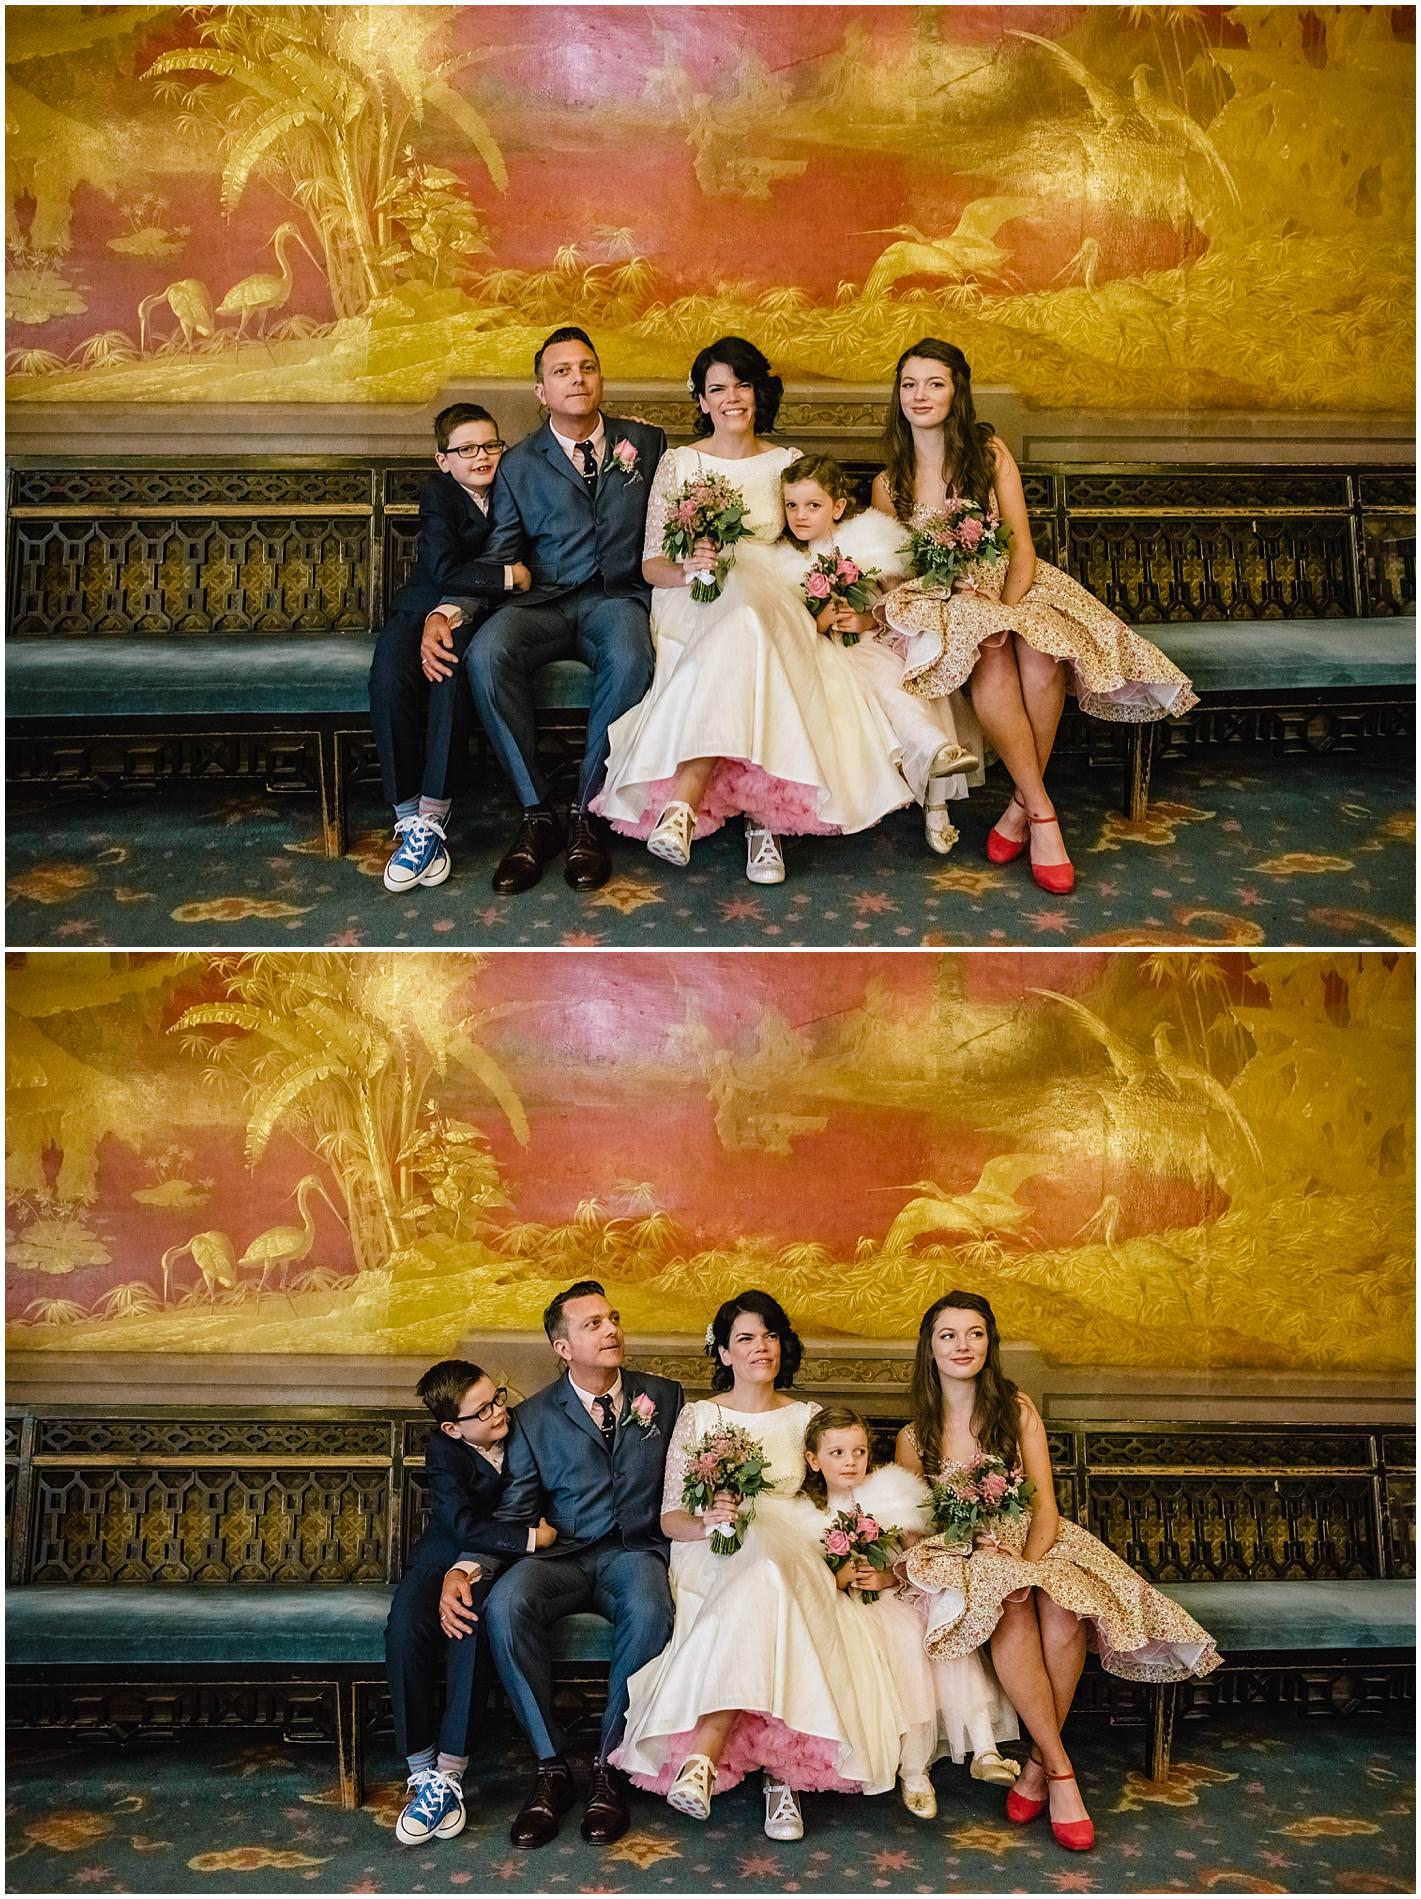 royal-pavilion-wedding-brighton384